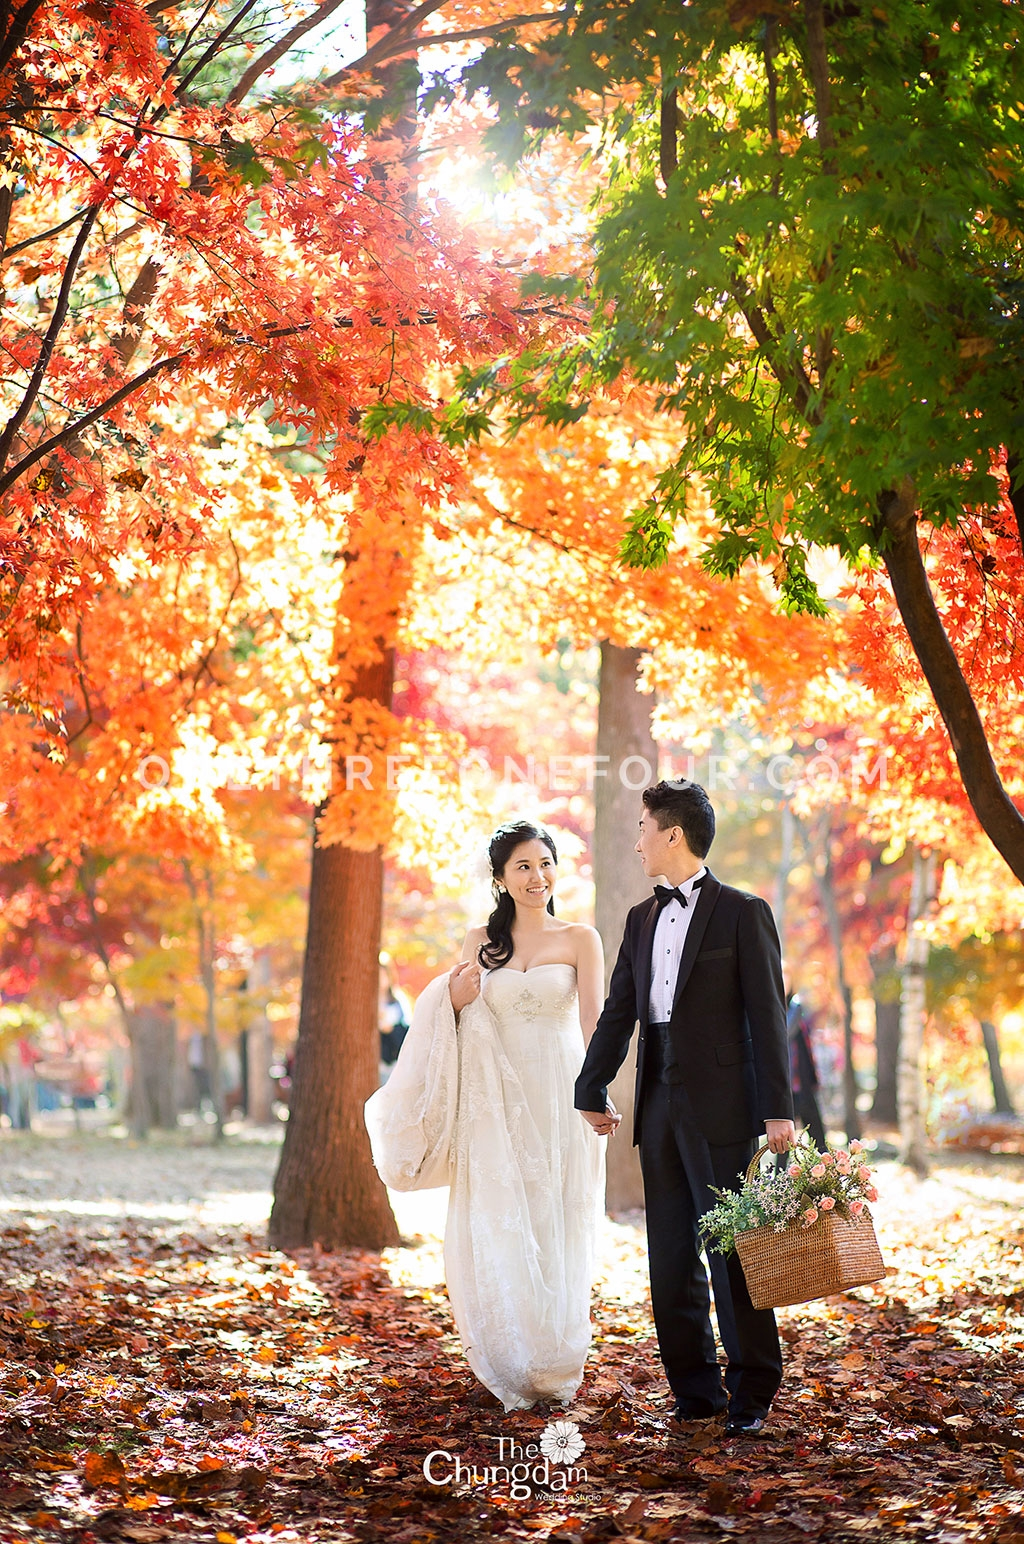 autumn seoul forest autumn outdoor shoot chungdam